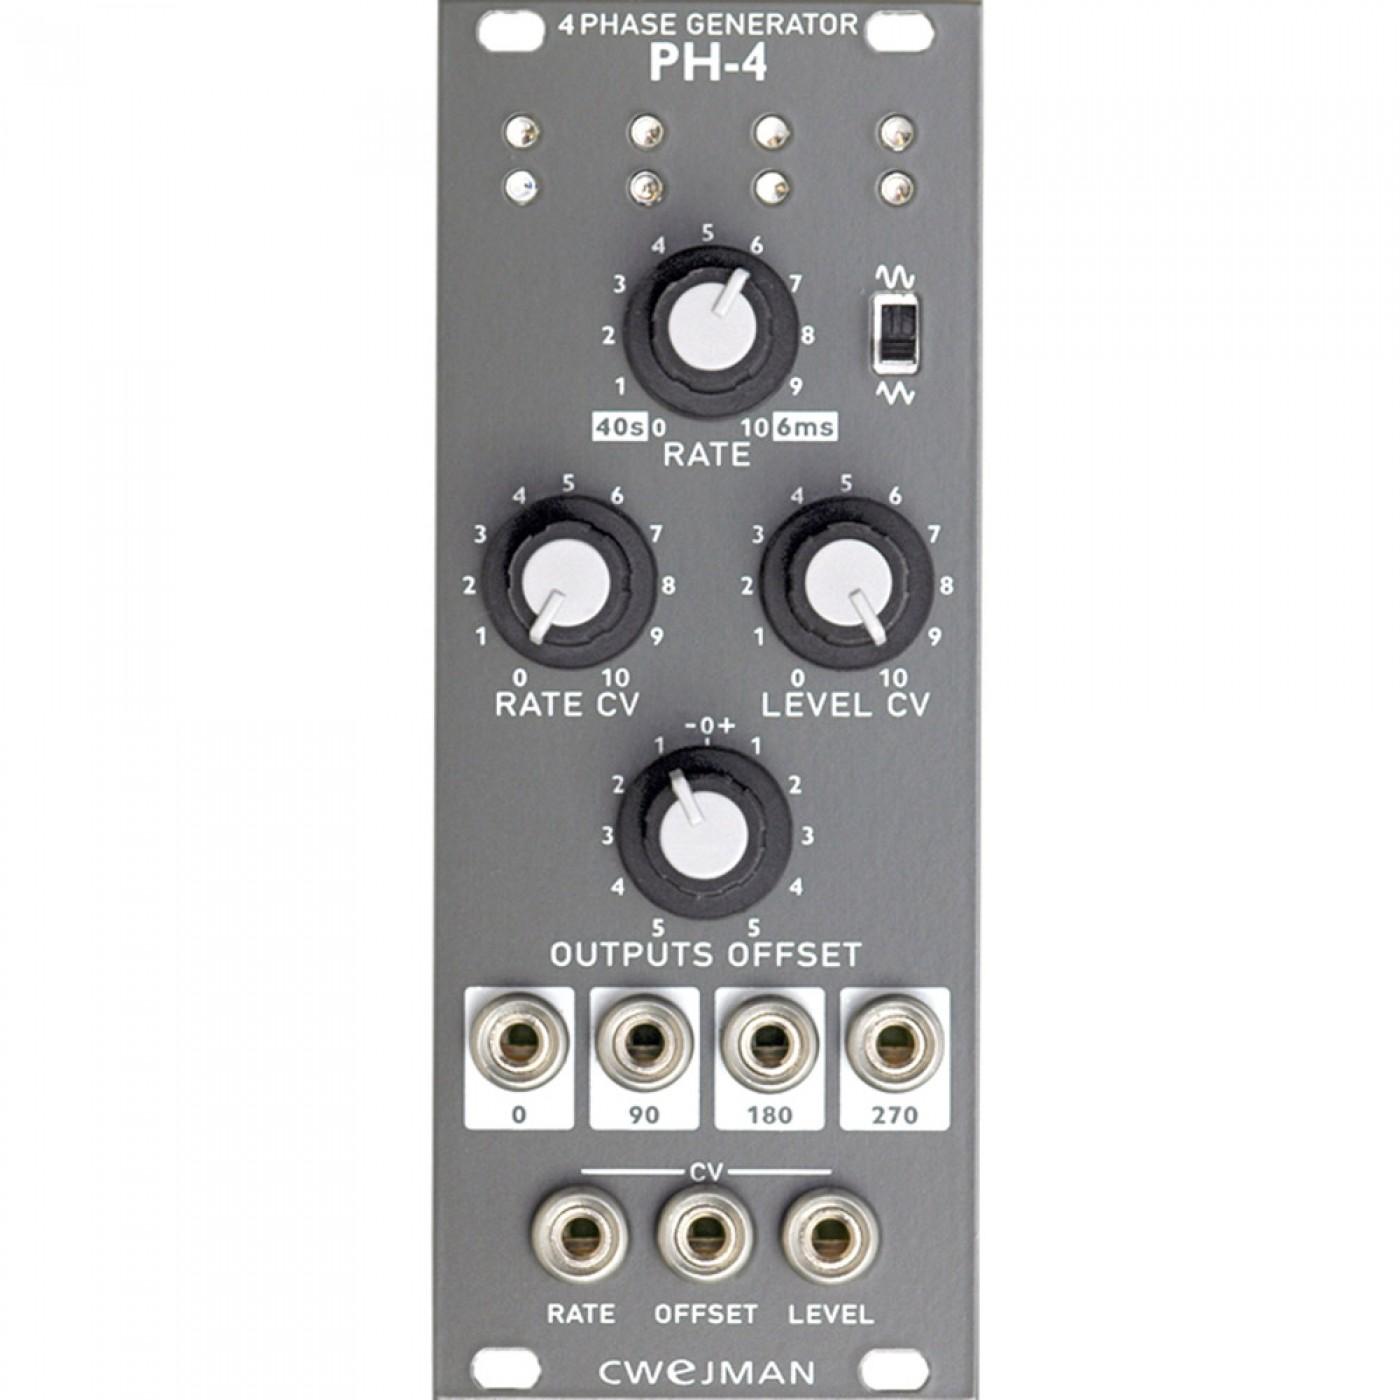 Cwejman PH-4 4-Phase-Modulator